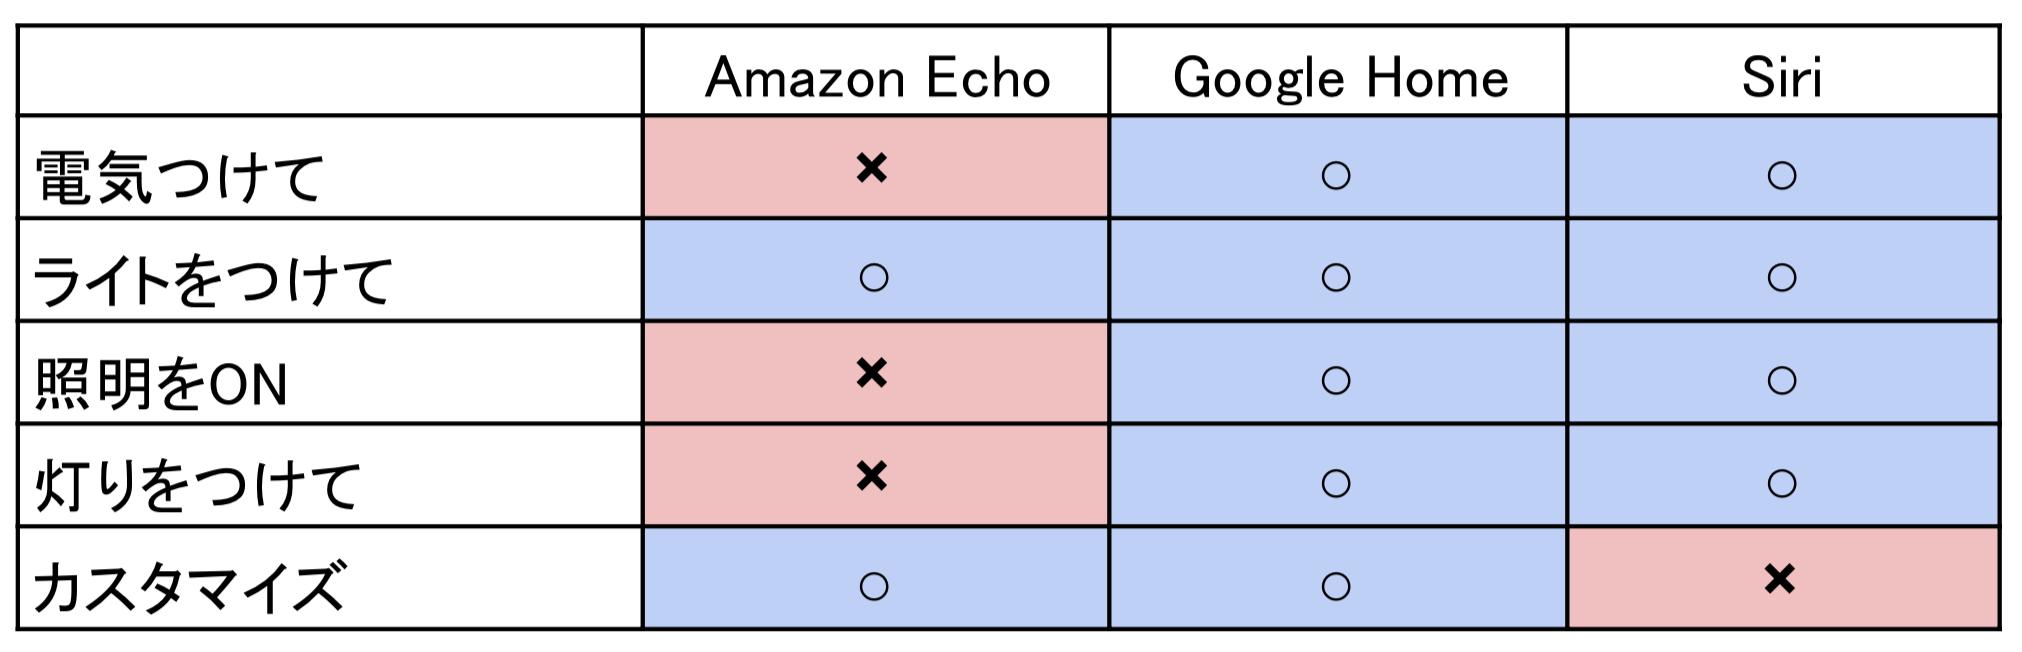 echo_google.png